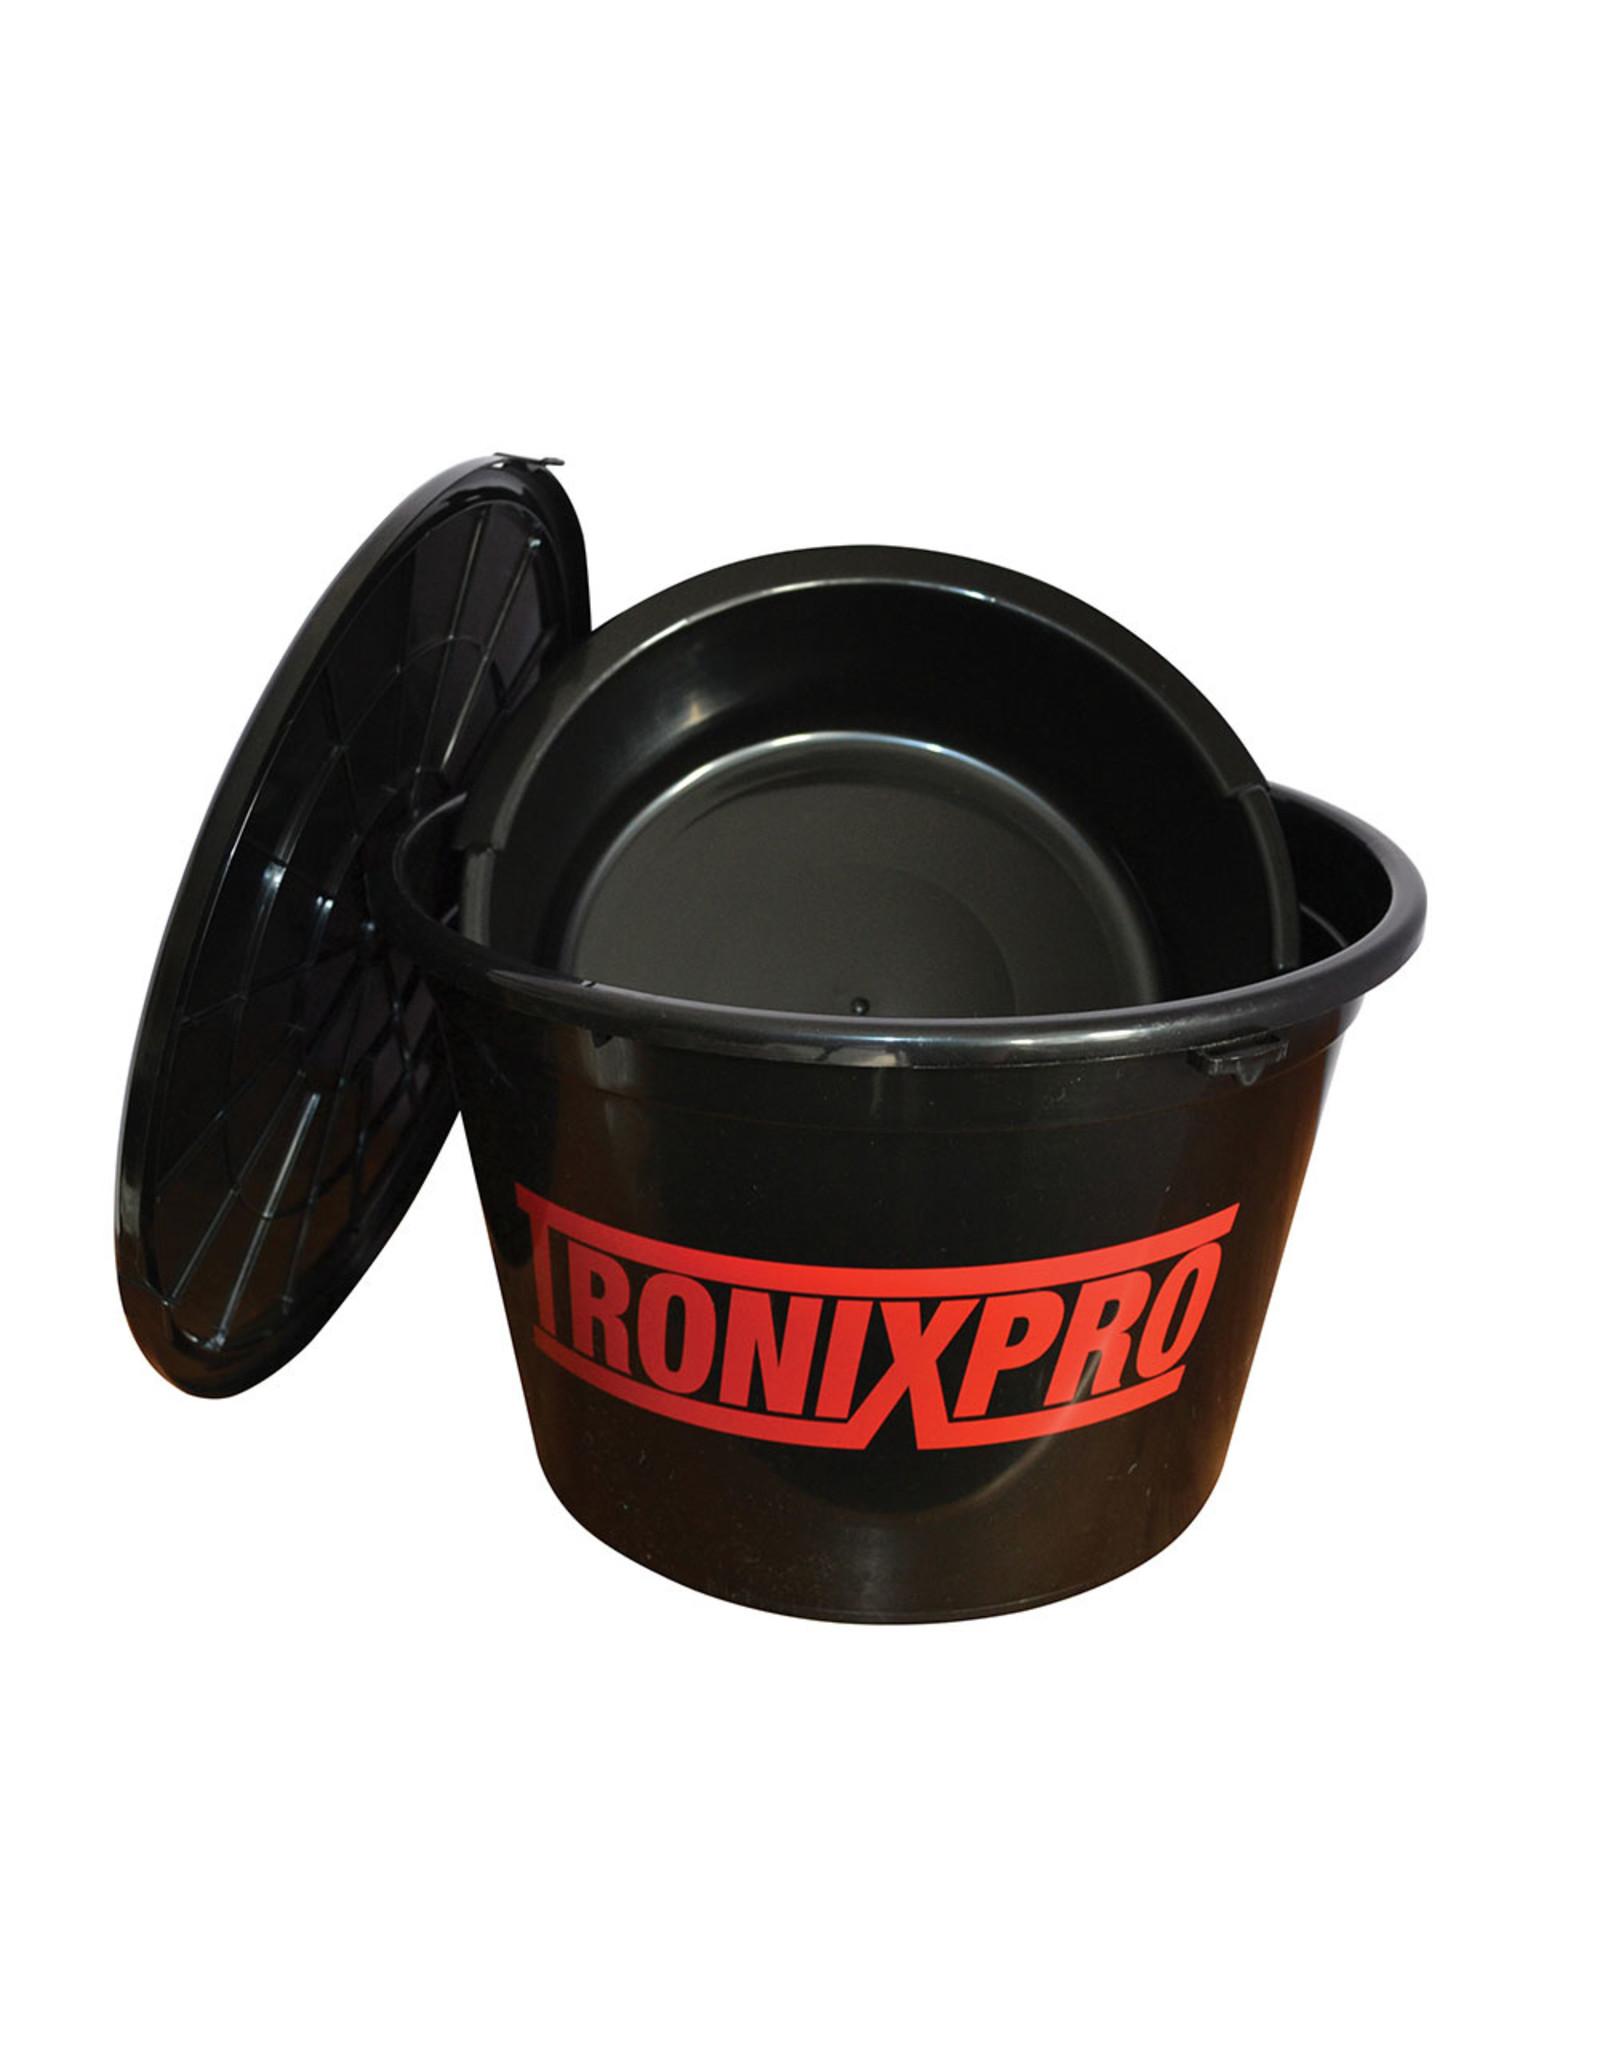 Tronix Tronixpro Bucket, Tray & Lid